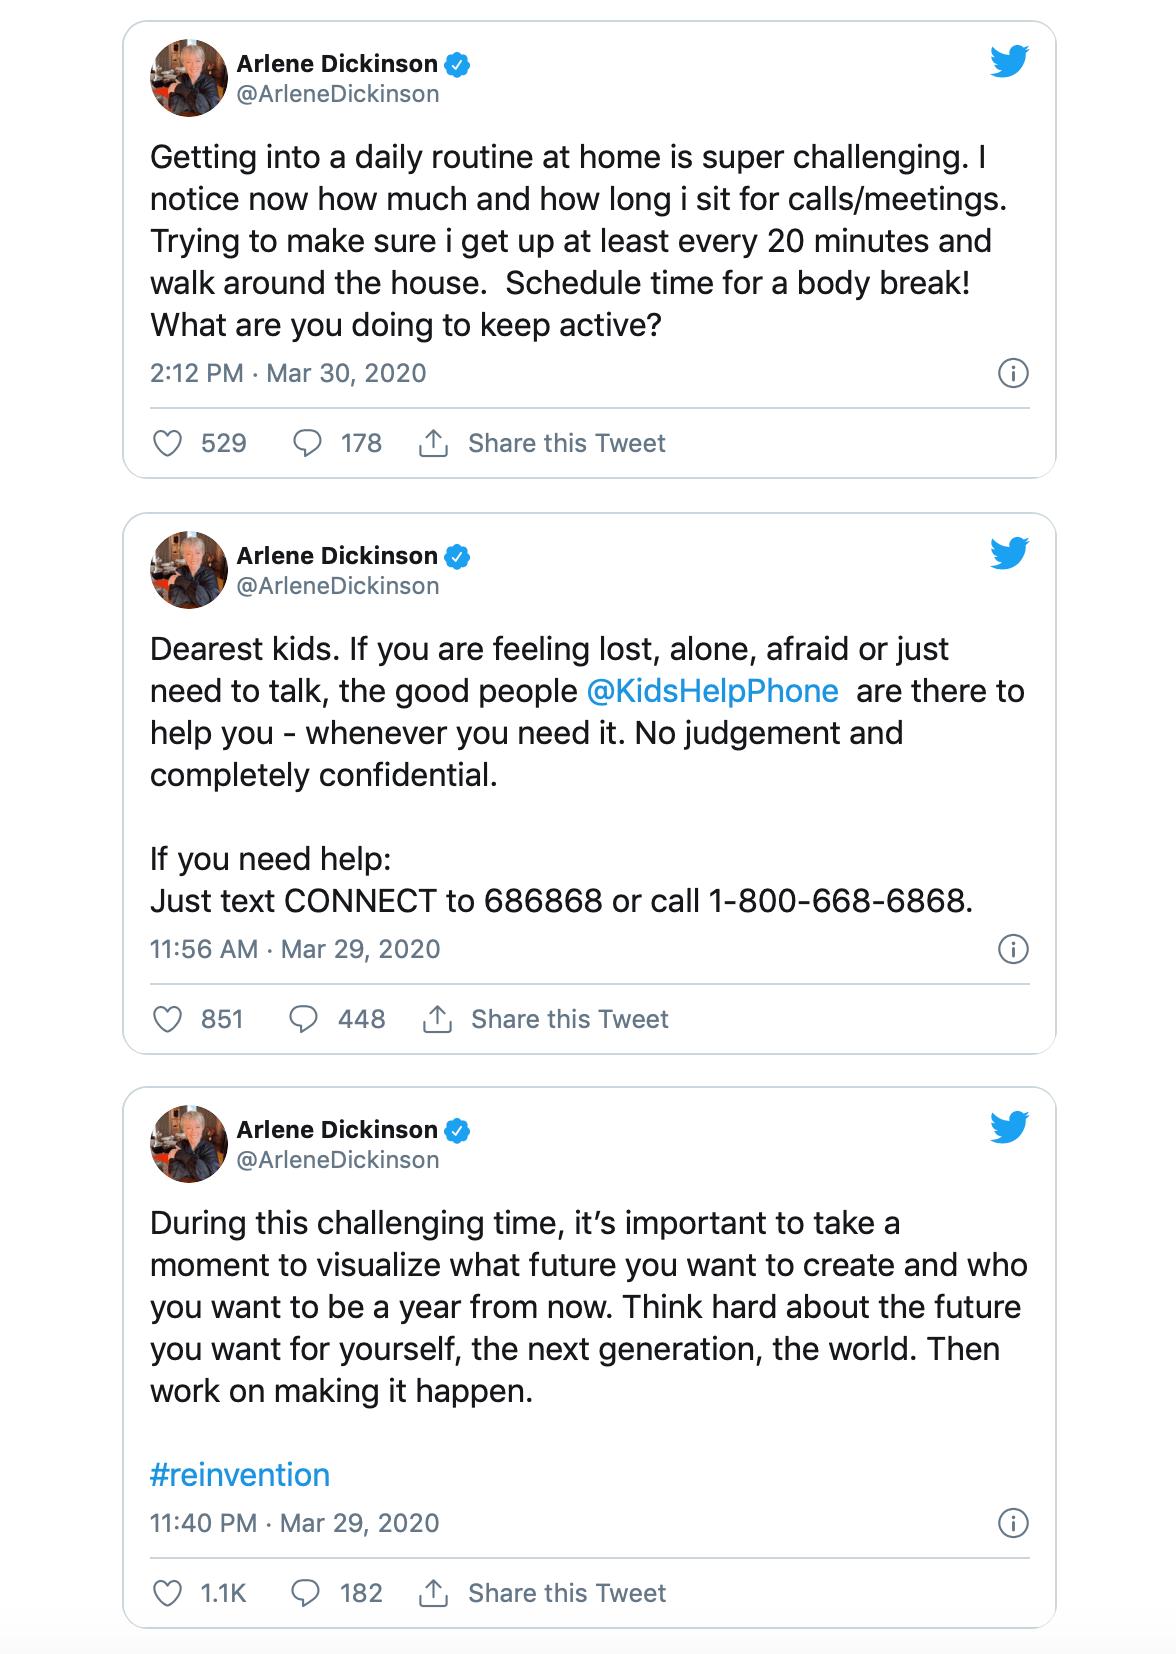 Arlene Dickinson Twitter account